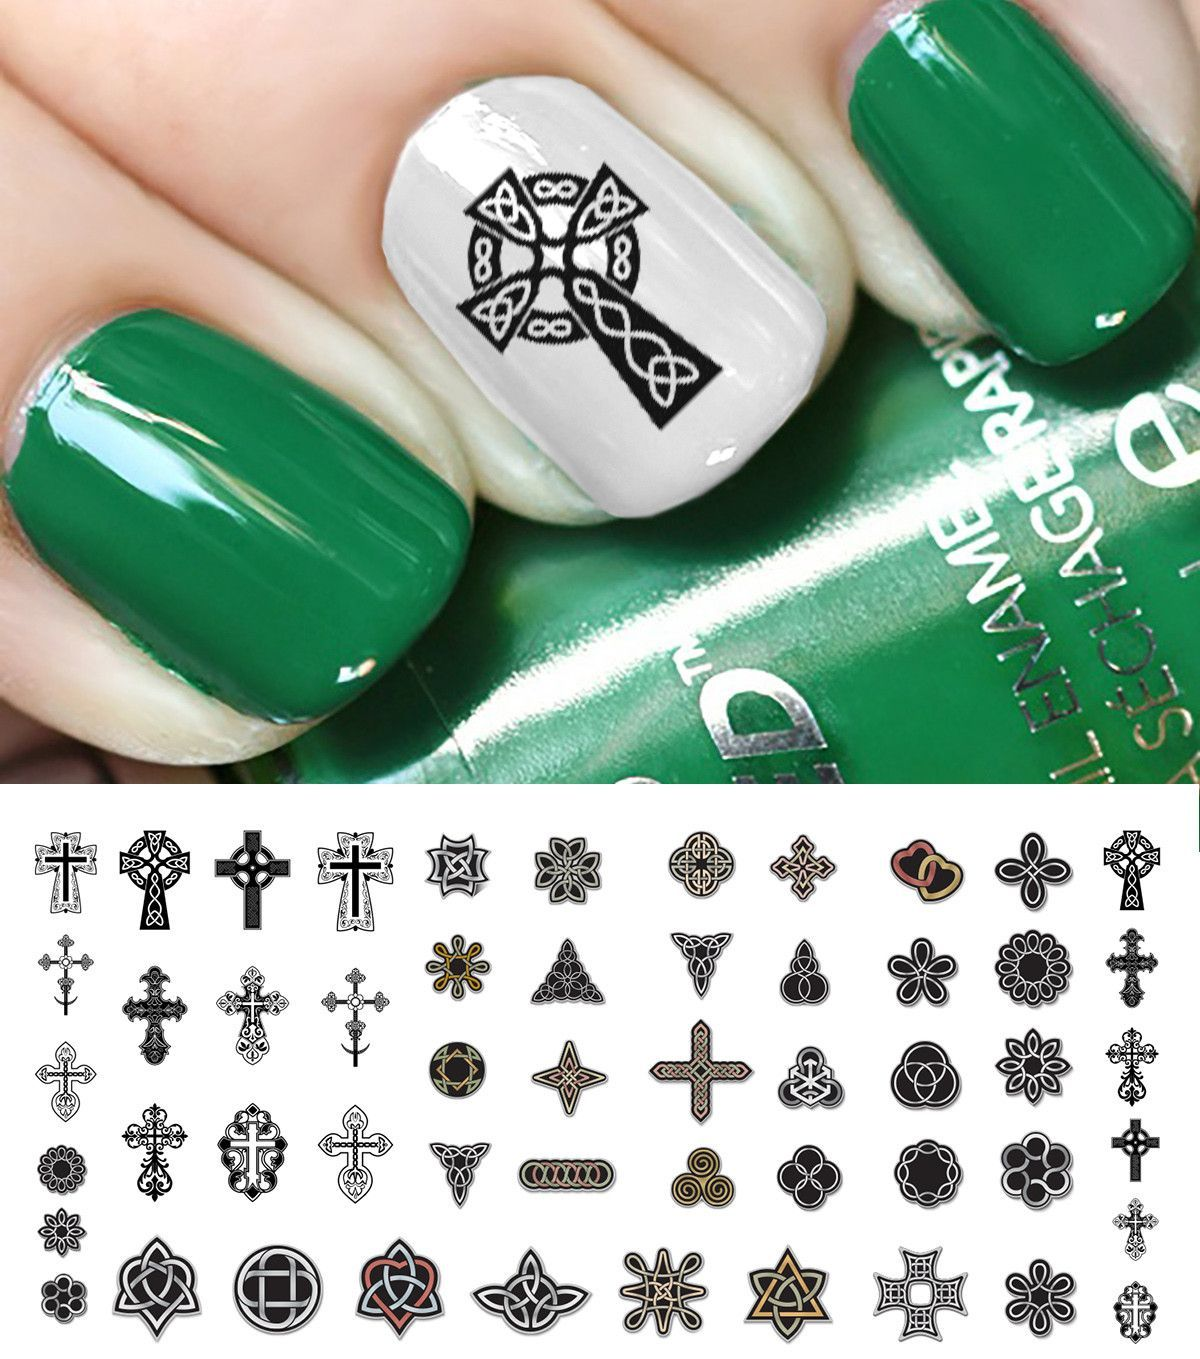 Celtic Cross Art Nail Art Decals Set #1   Nail Art   Pinterest ...